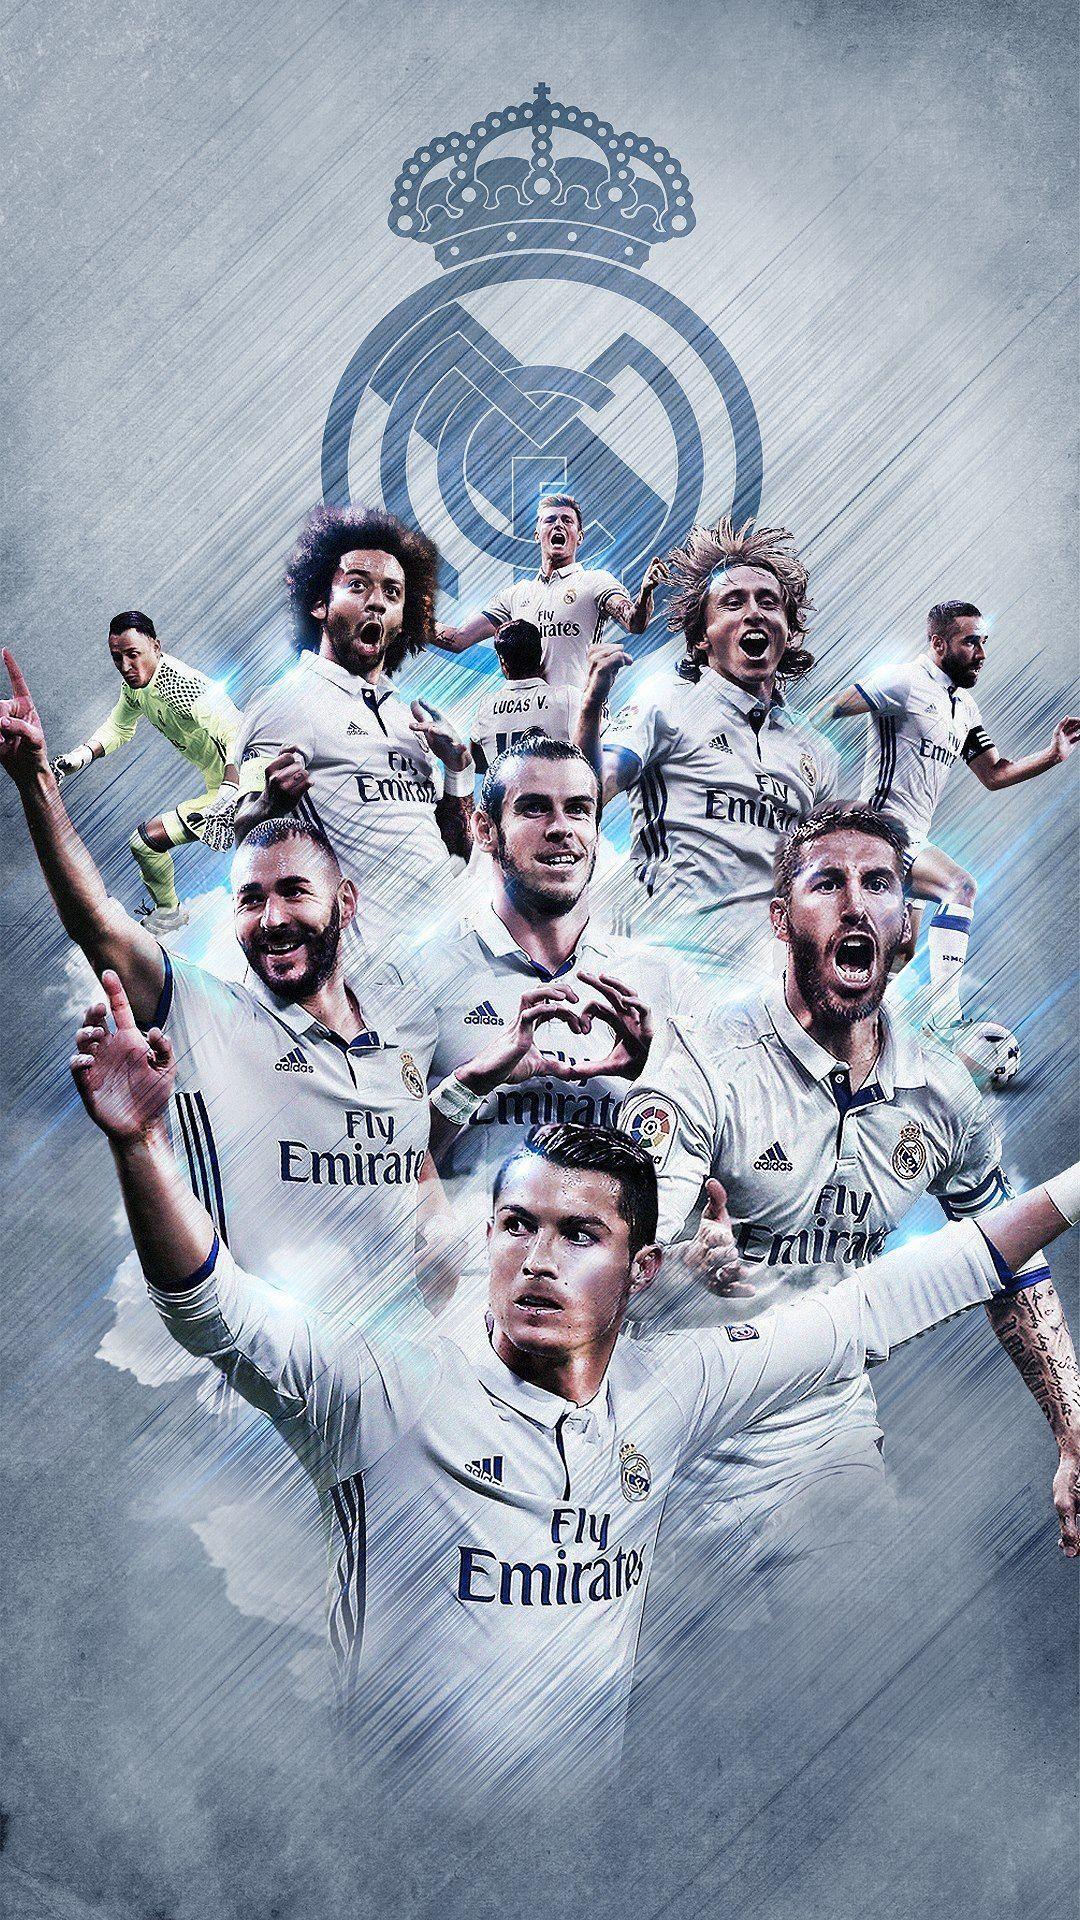 Http Mobw Org 34845 Real Madrid Wallpaper Html Real Madrid Wallpaper Real Madrid Wallpapers Real Madrid Football Madrid Wallpaper